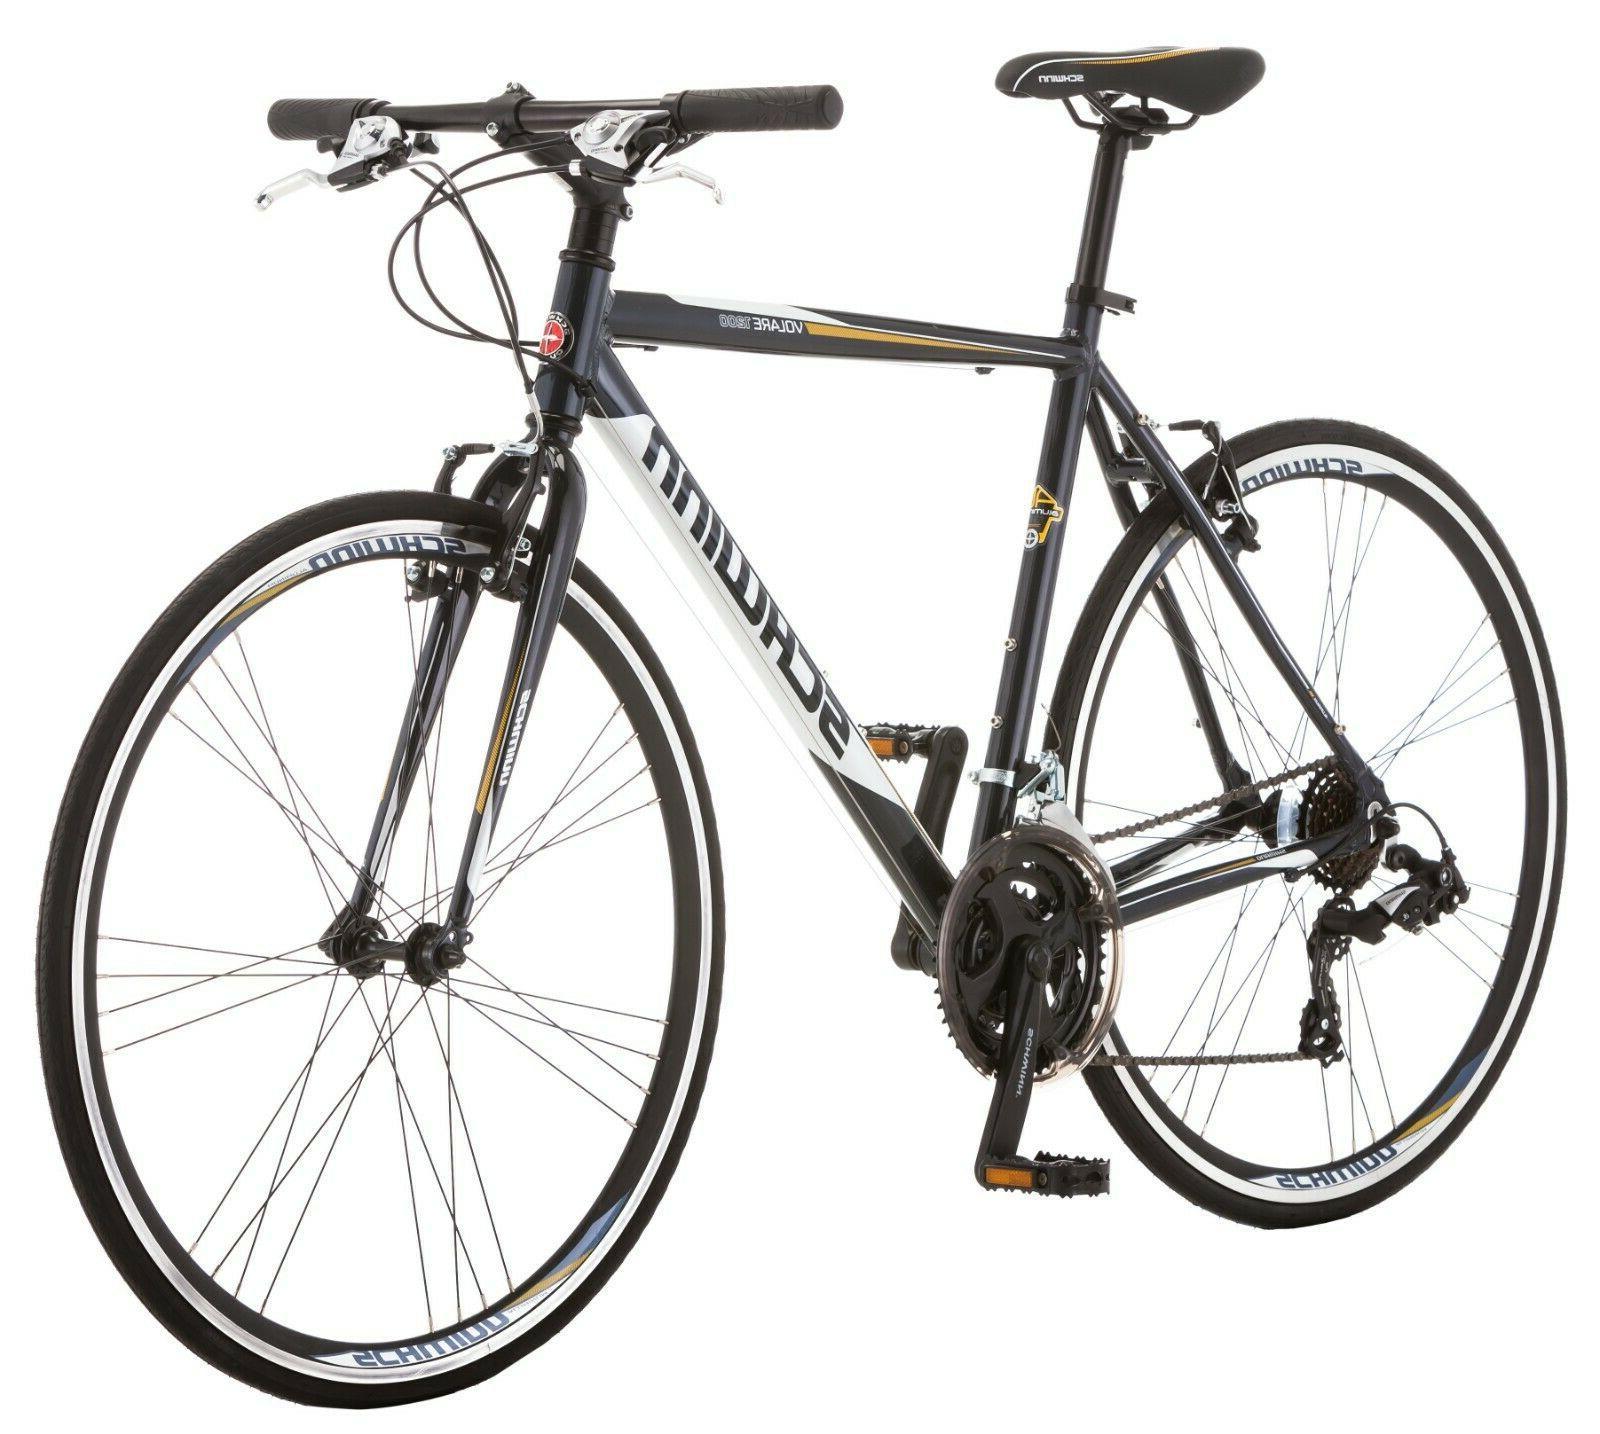 volare 1200 700c road bike grey